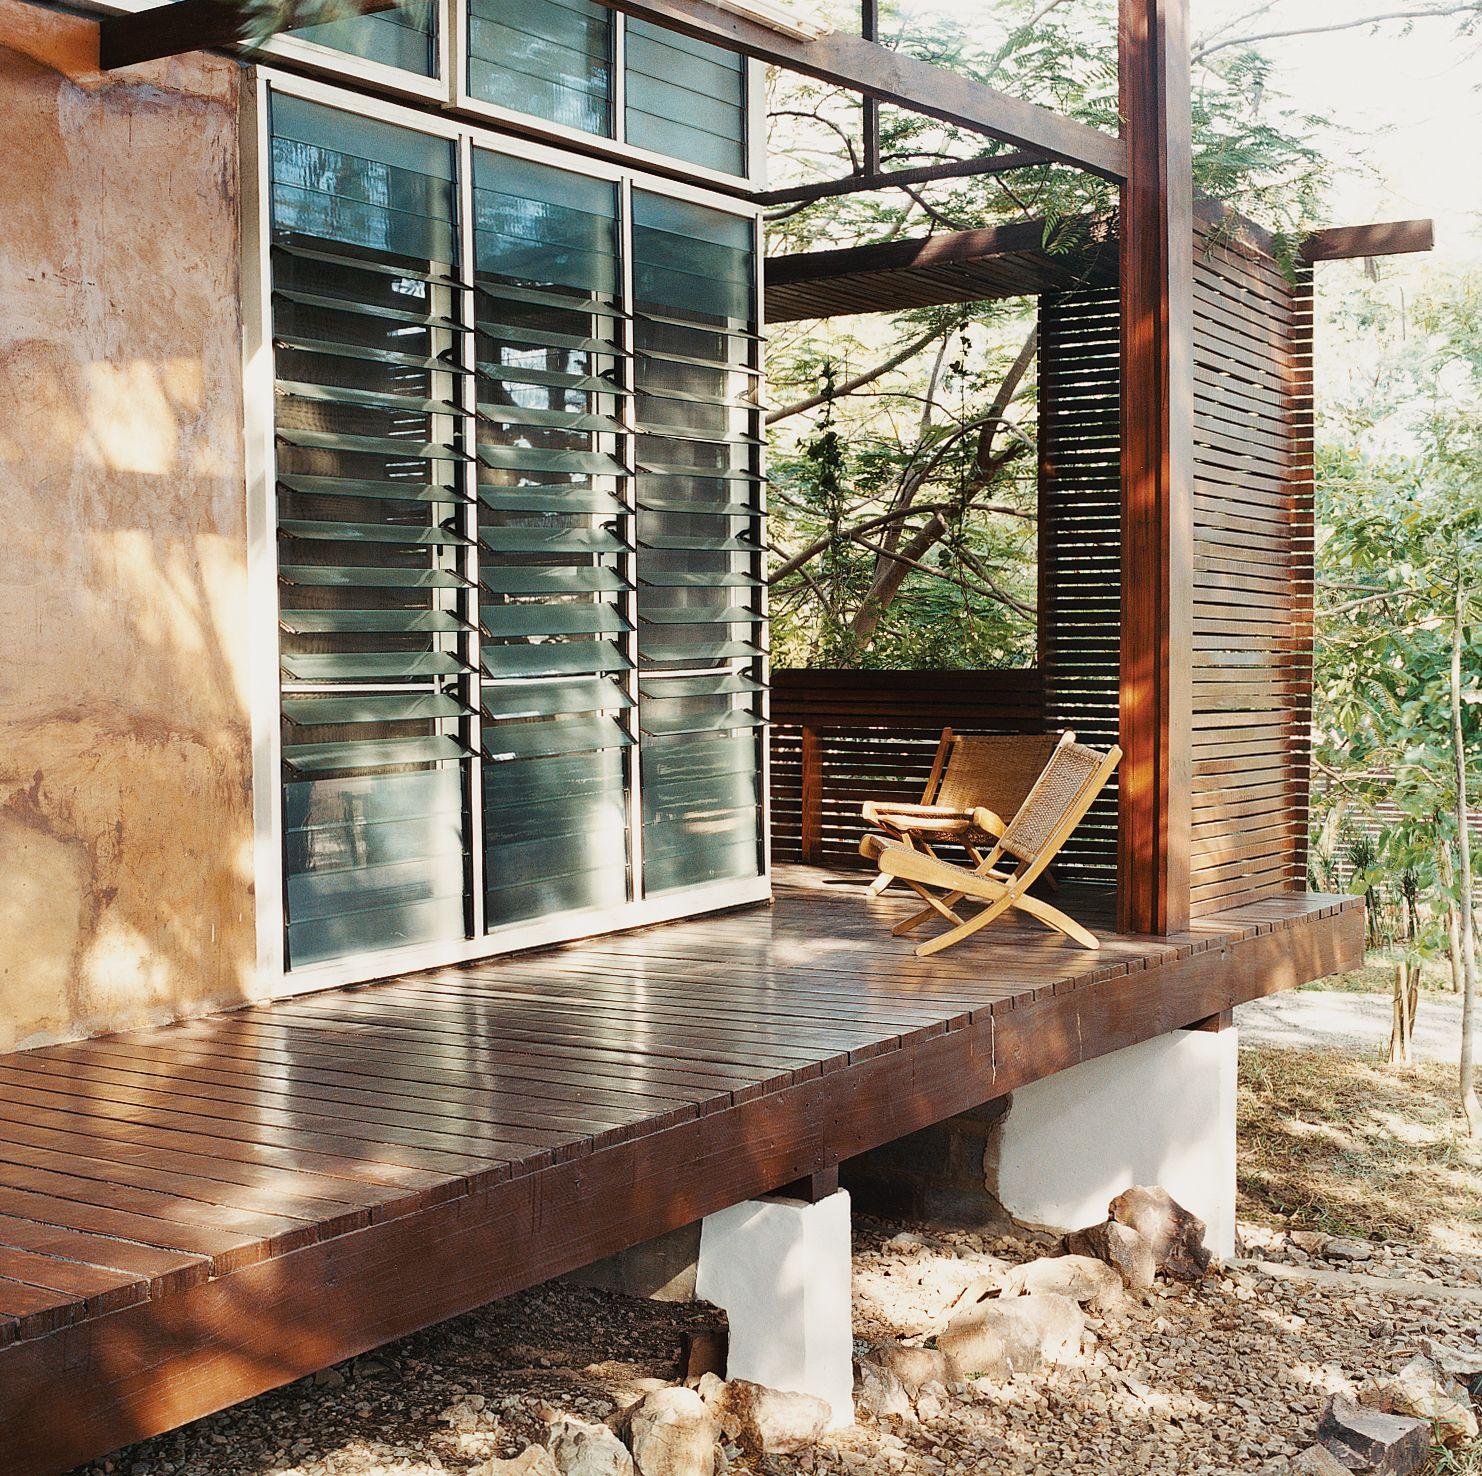 Contact | Wood slats, Flat roof and Facades